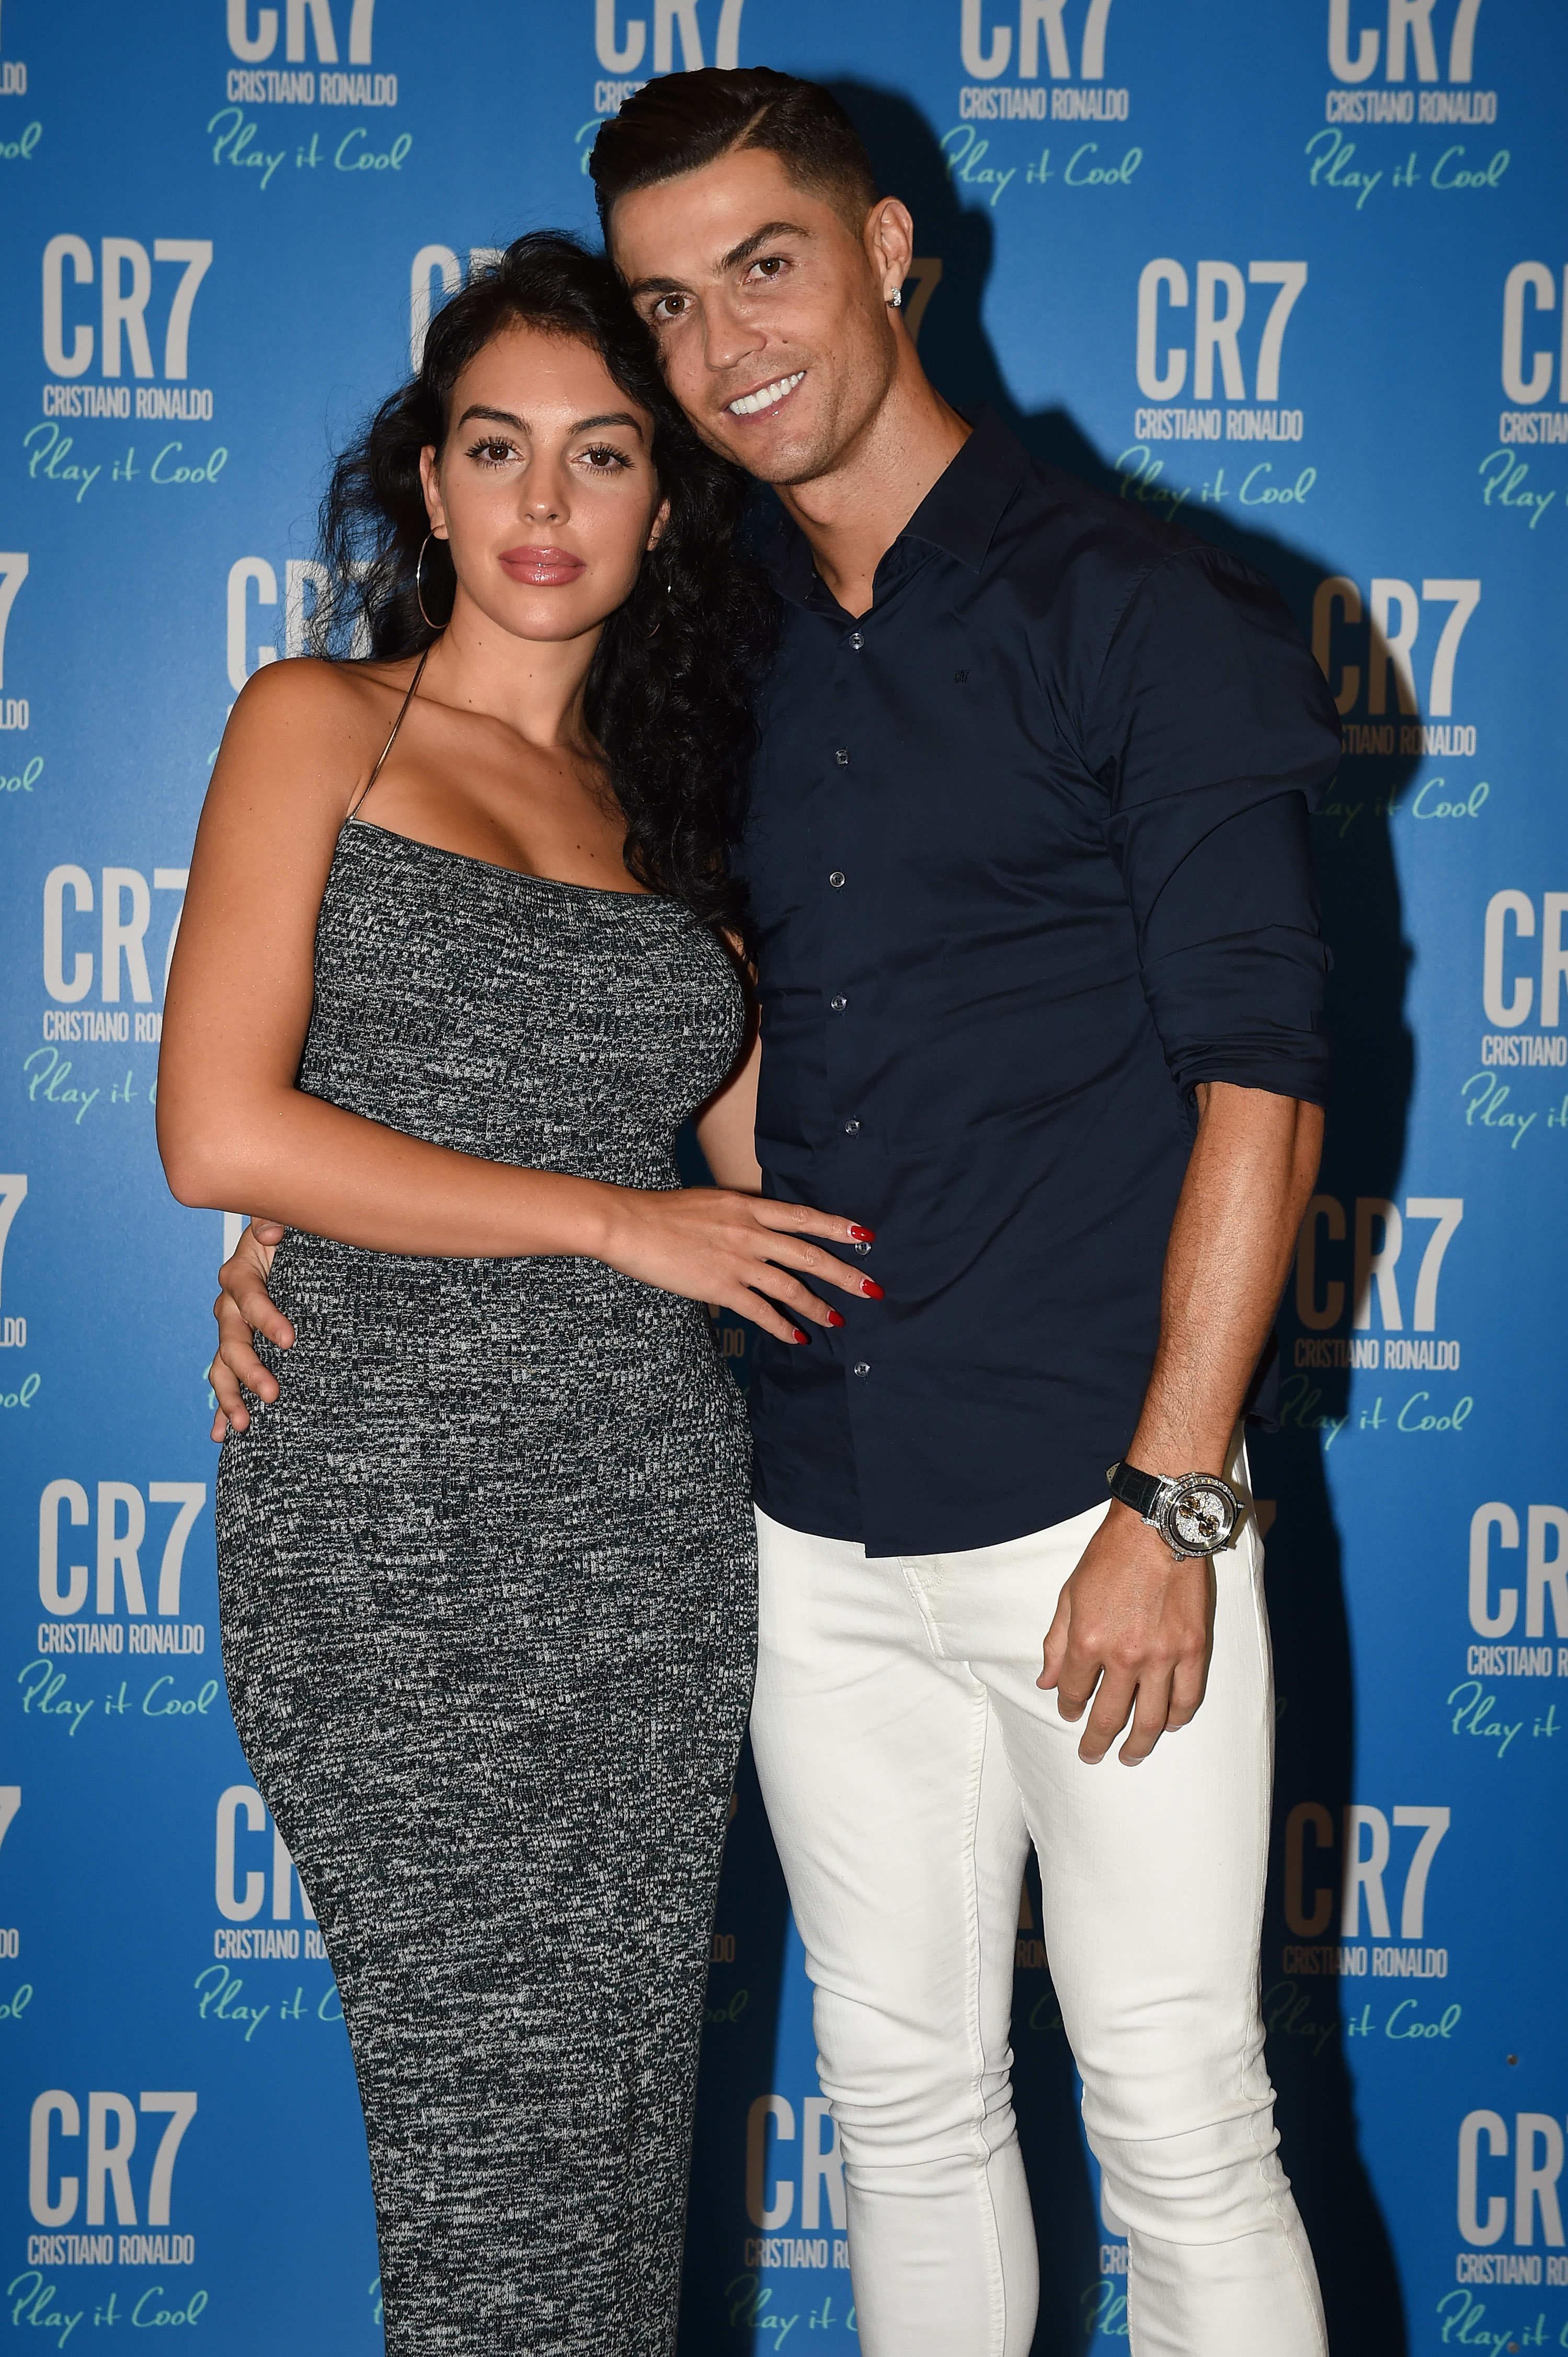 Georgina Rodriguez and Cristiano Ronaldo on the red carpet